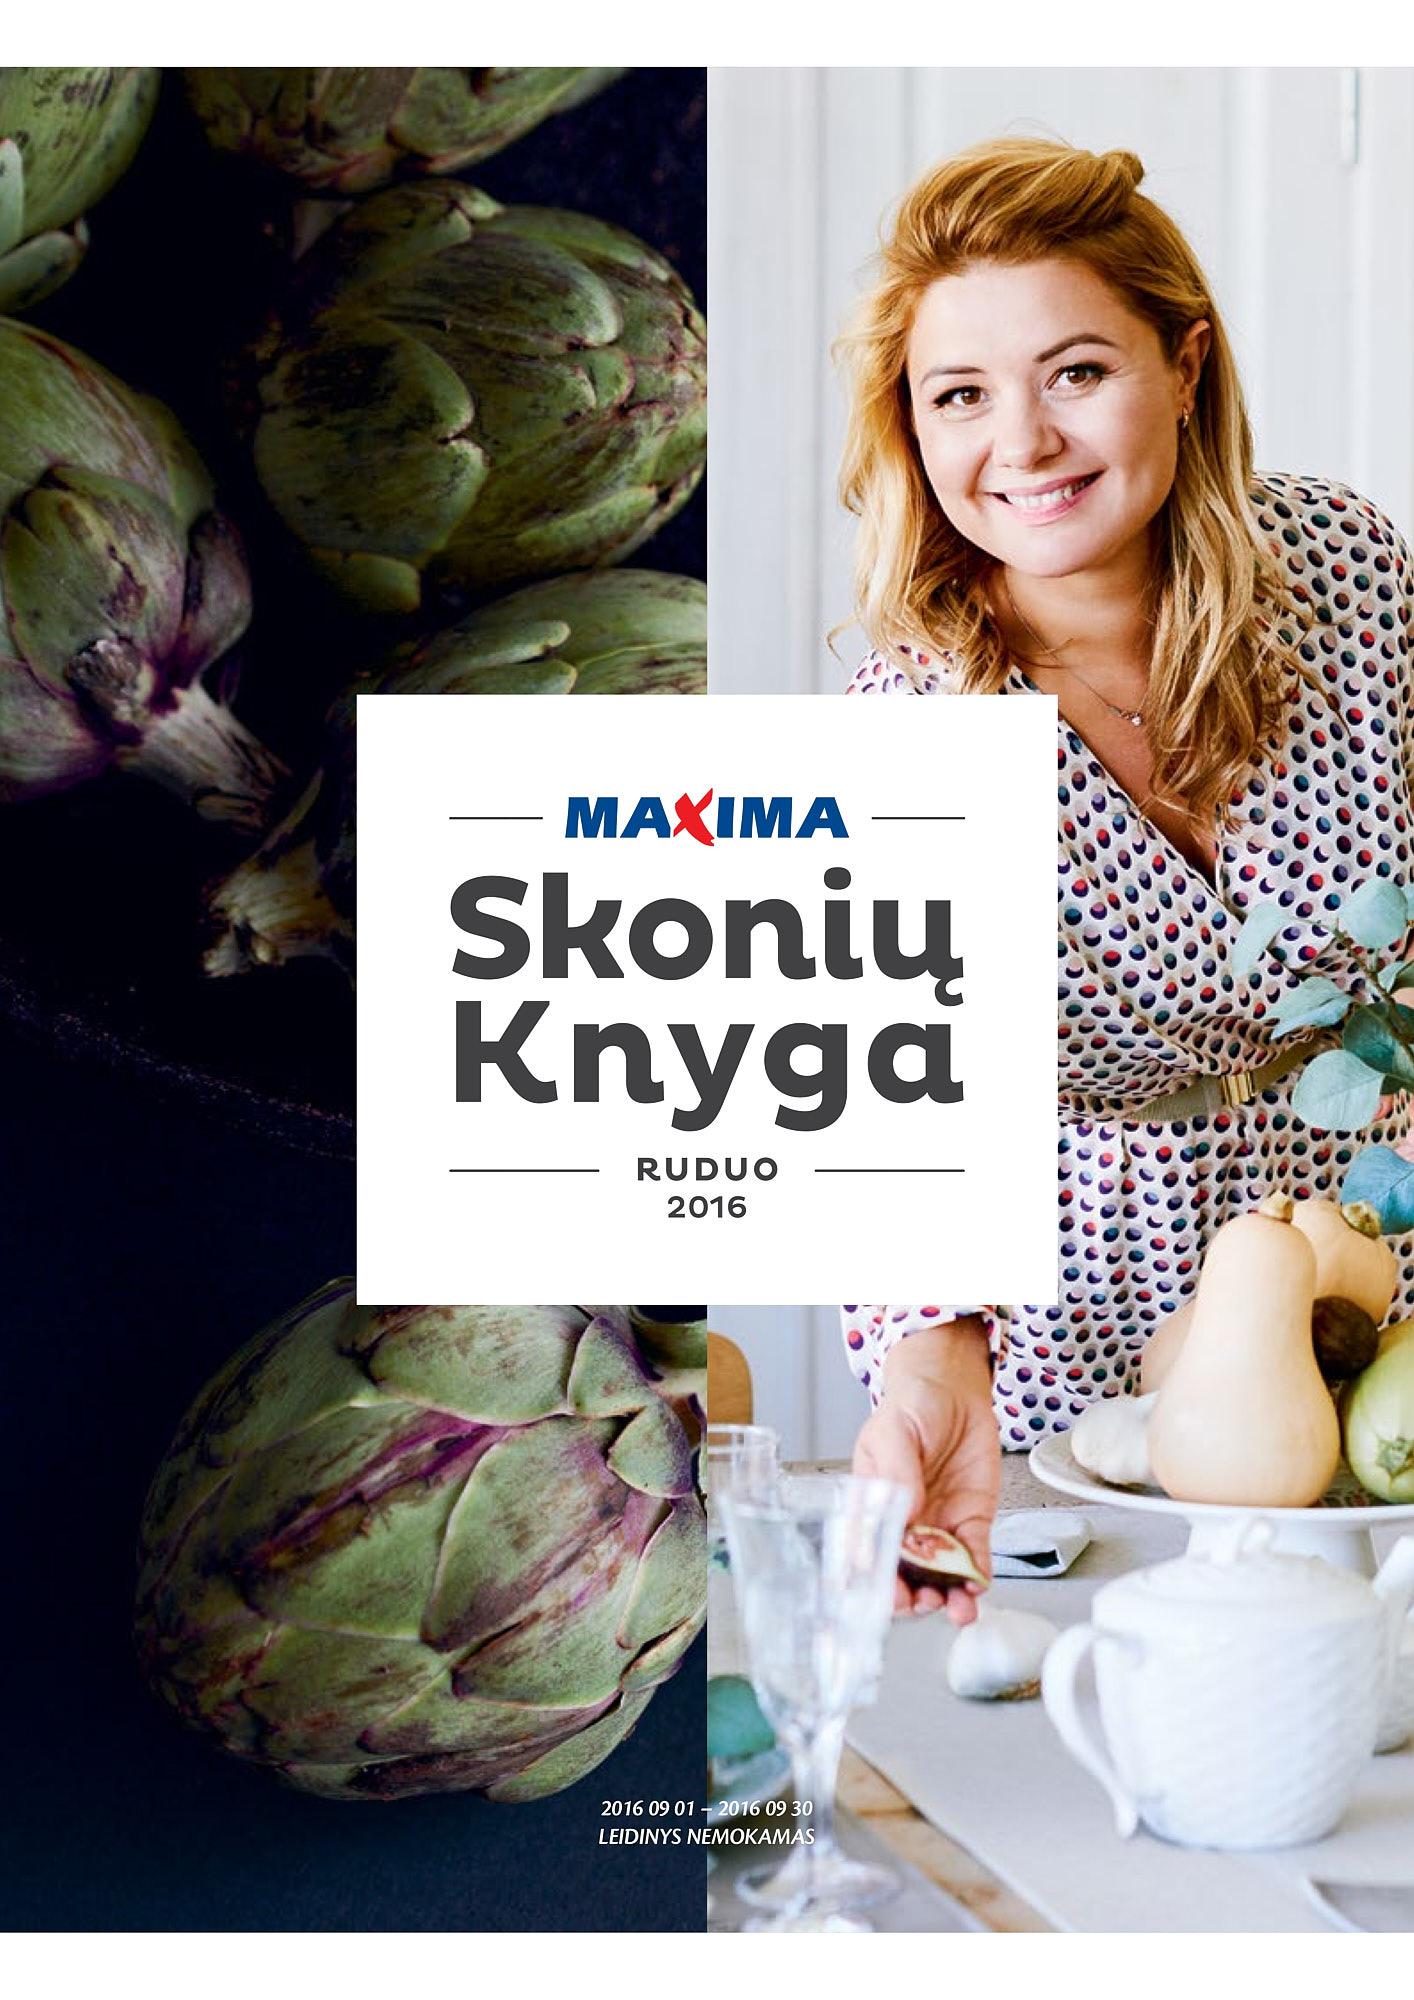 MAXIMA_2016_ruduo_skoniuknyga_35